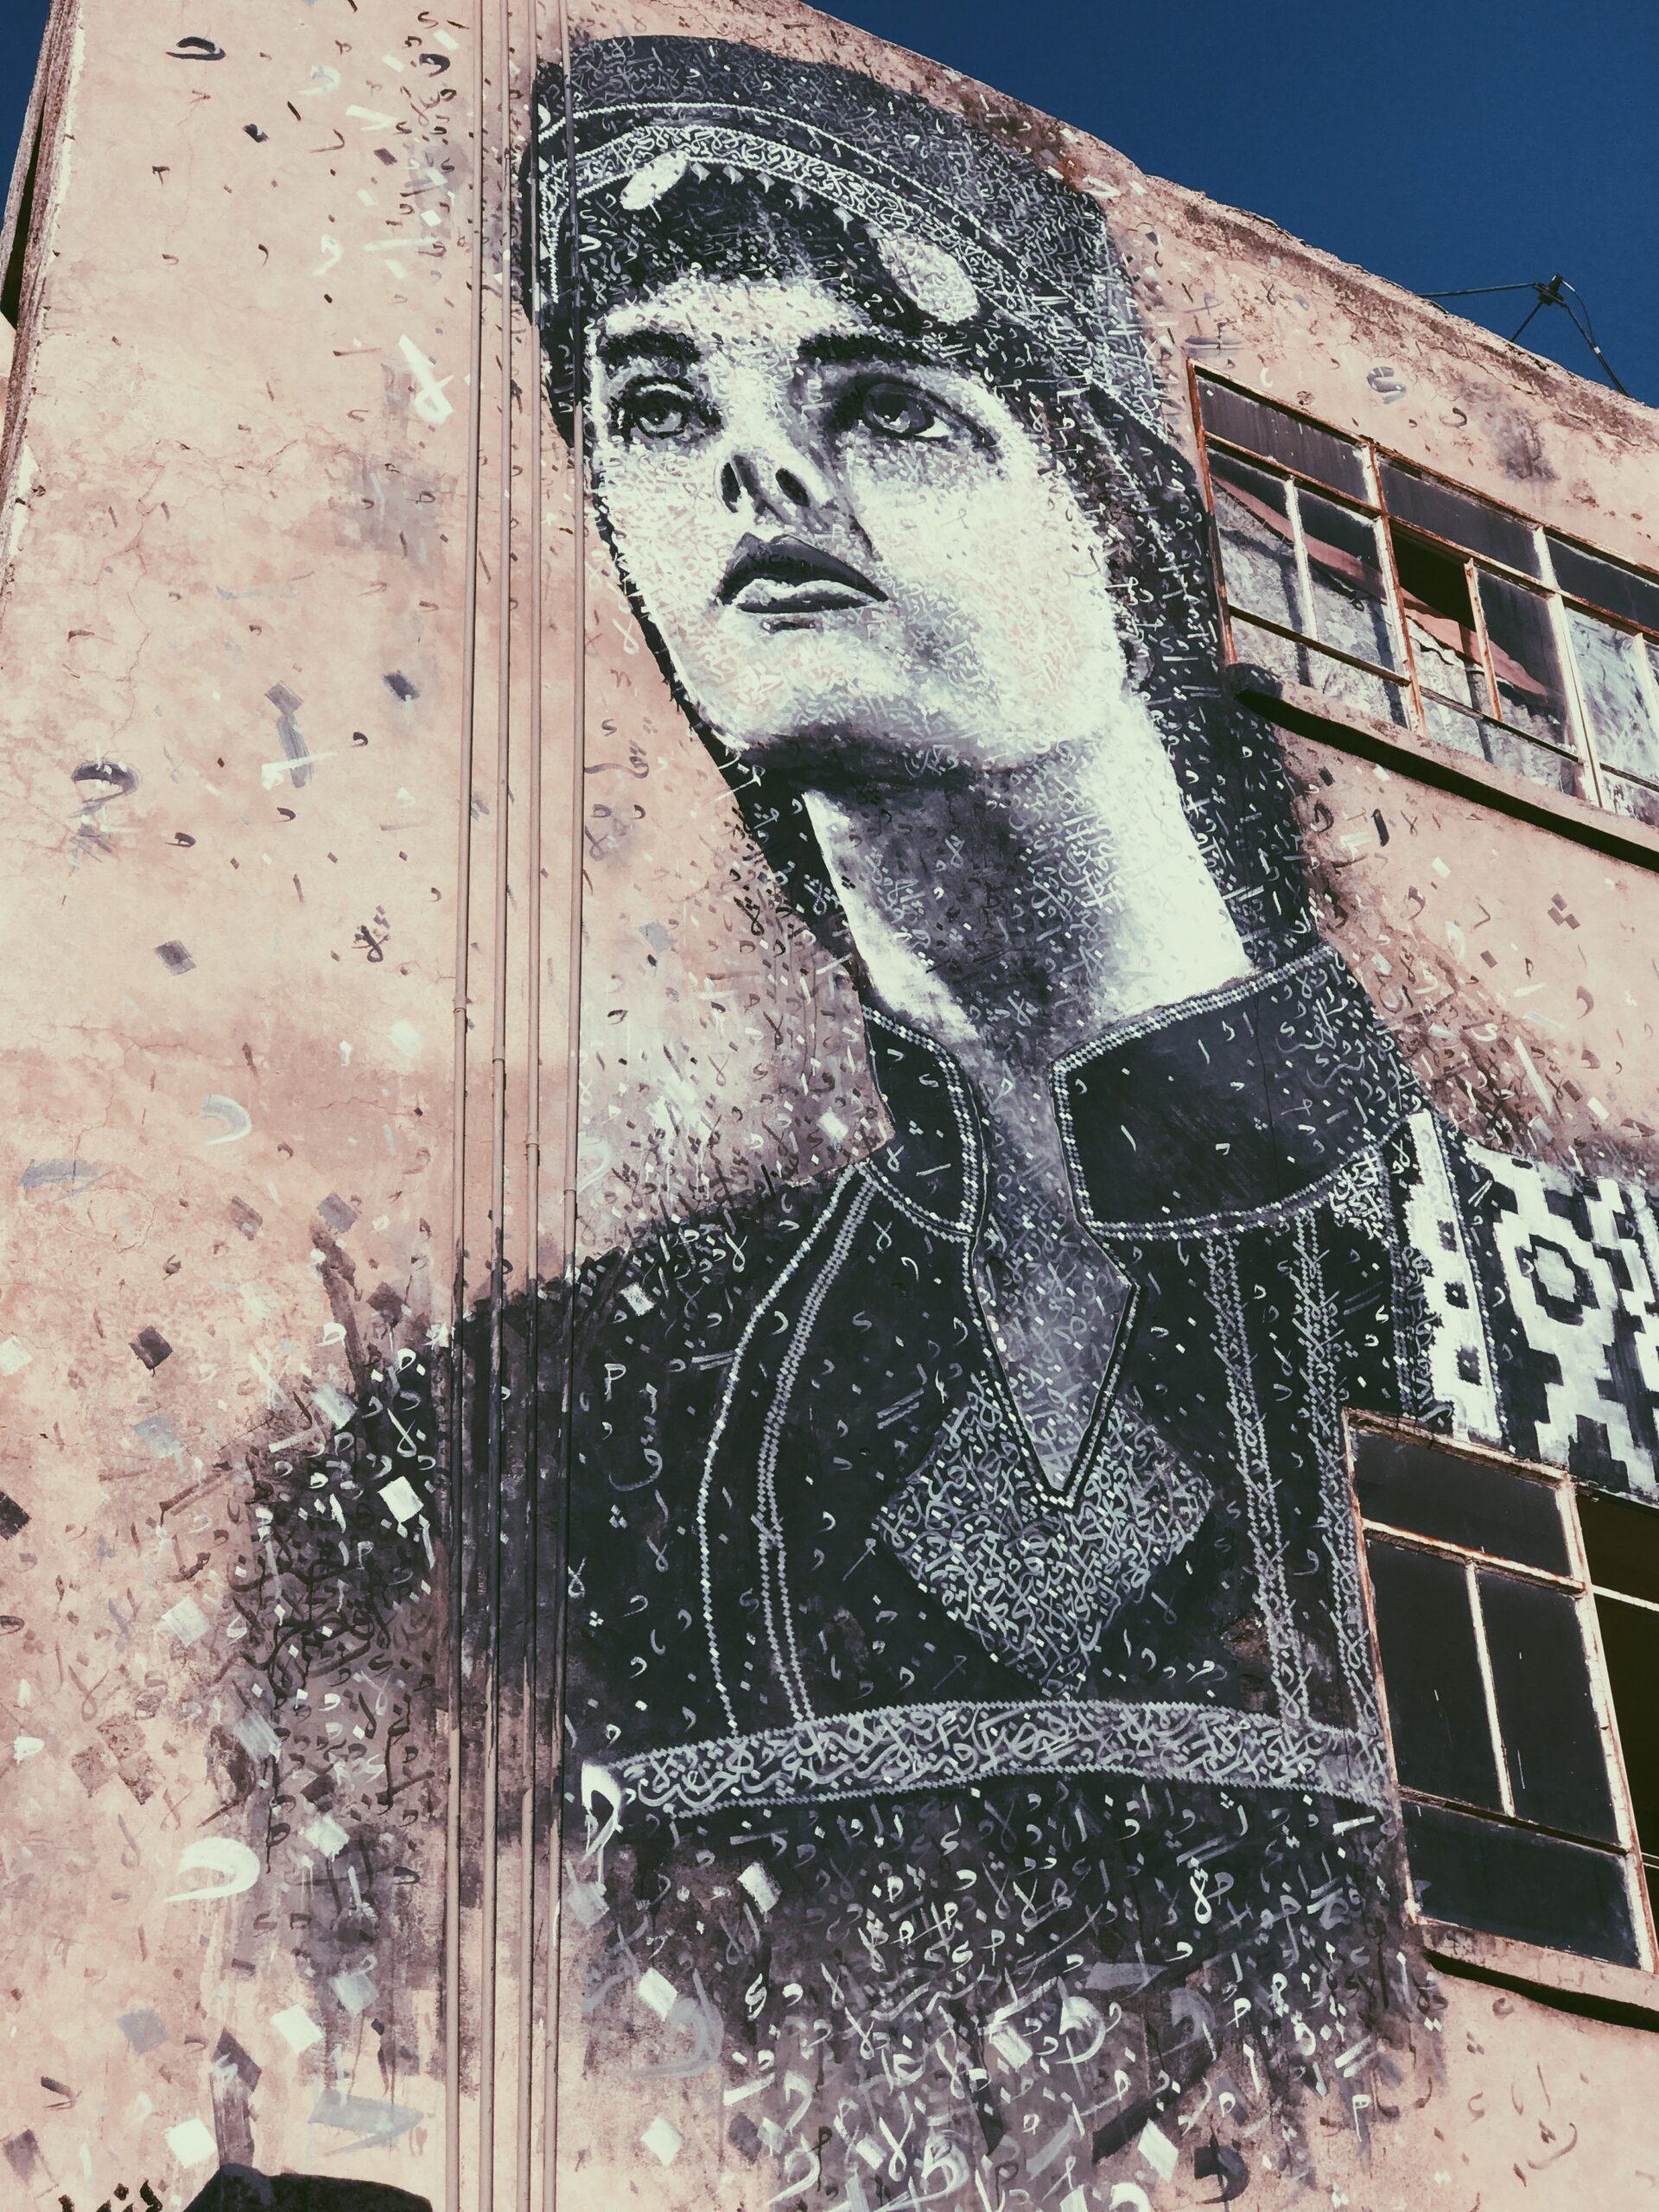 Amman – one of the city's the graffiti murals